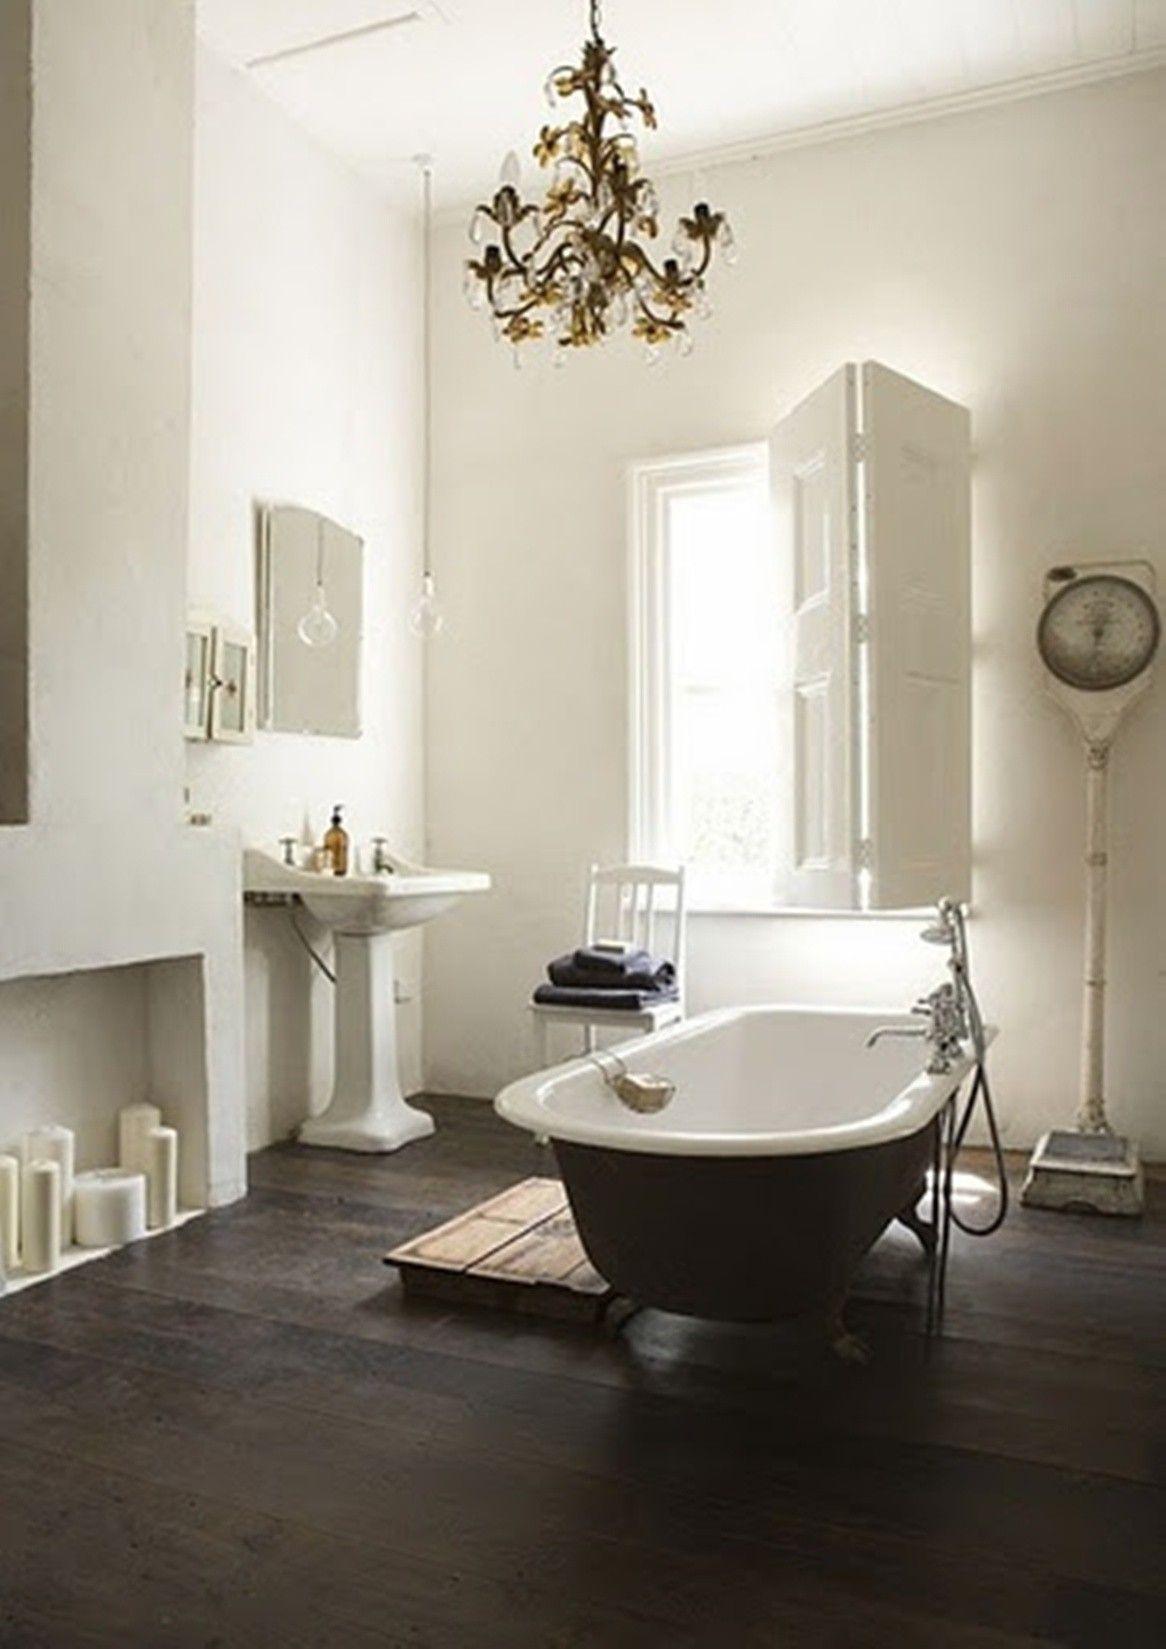 Lighting Basement Washroom Stairs: Image Result For Victorian Bathroom Lighting Ideas